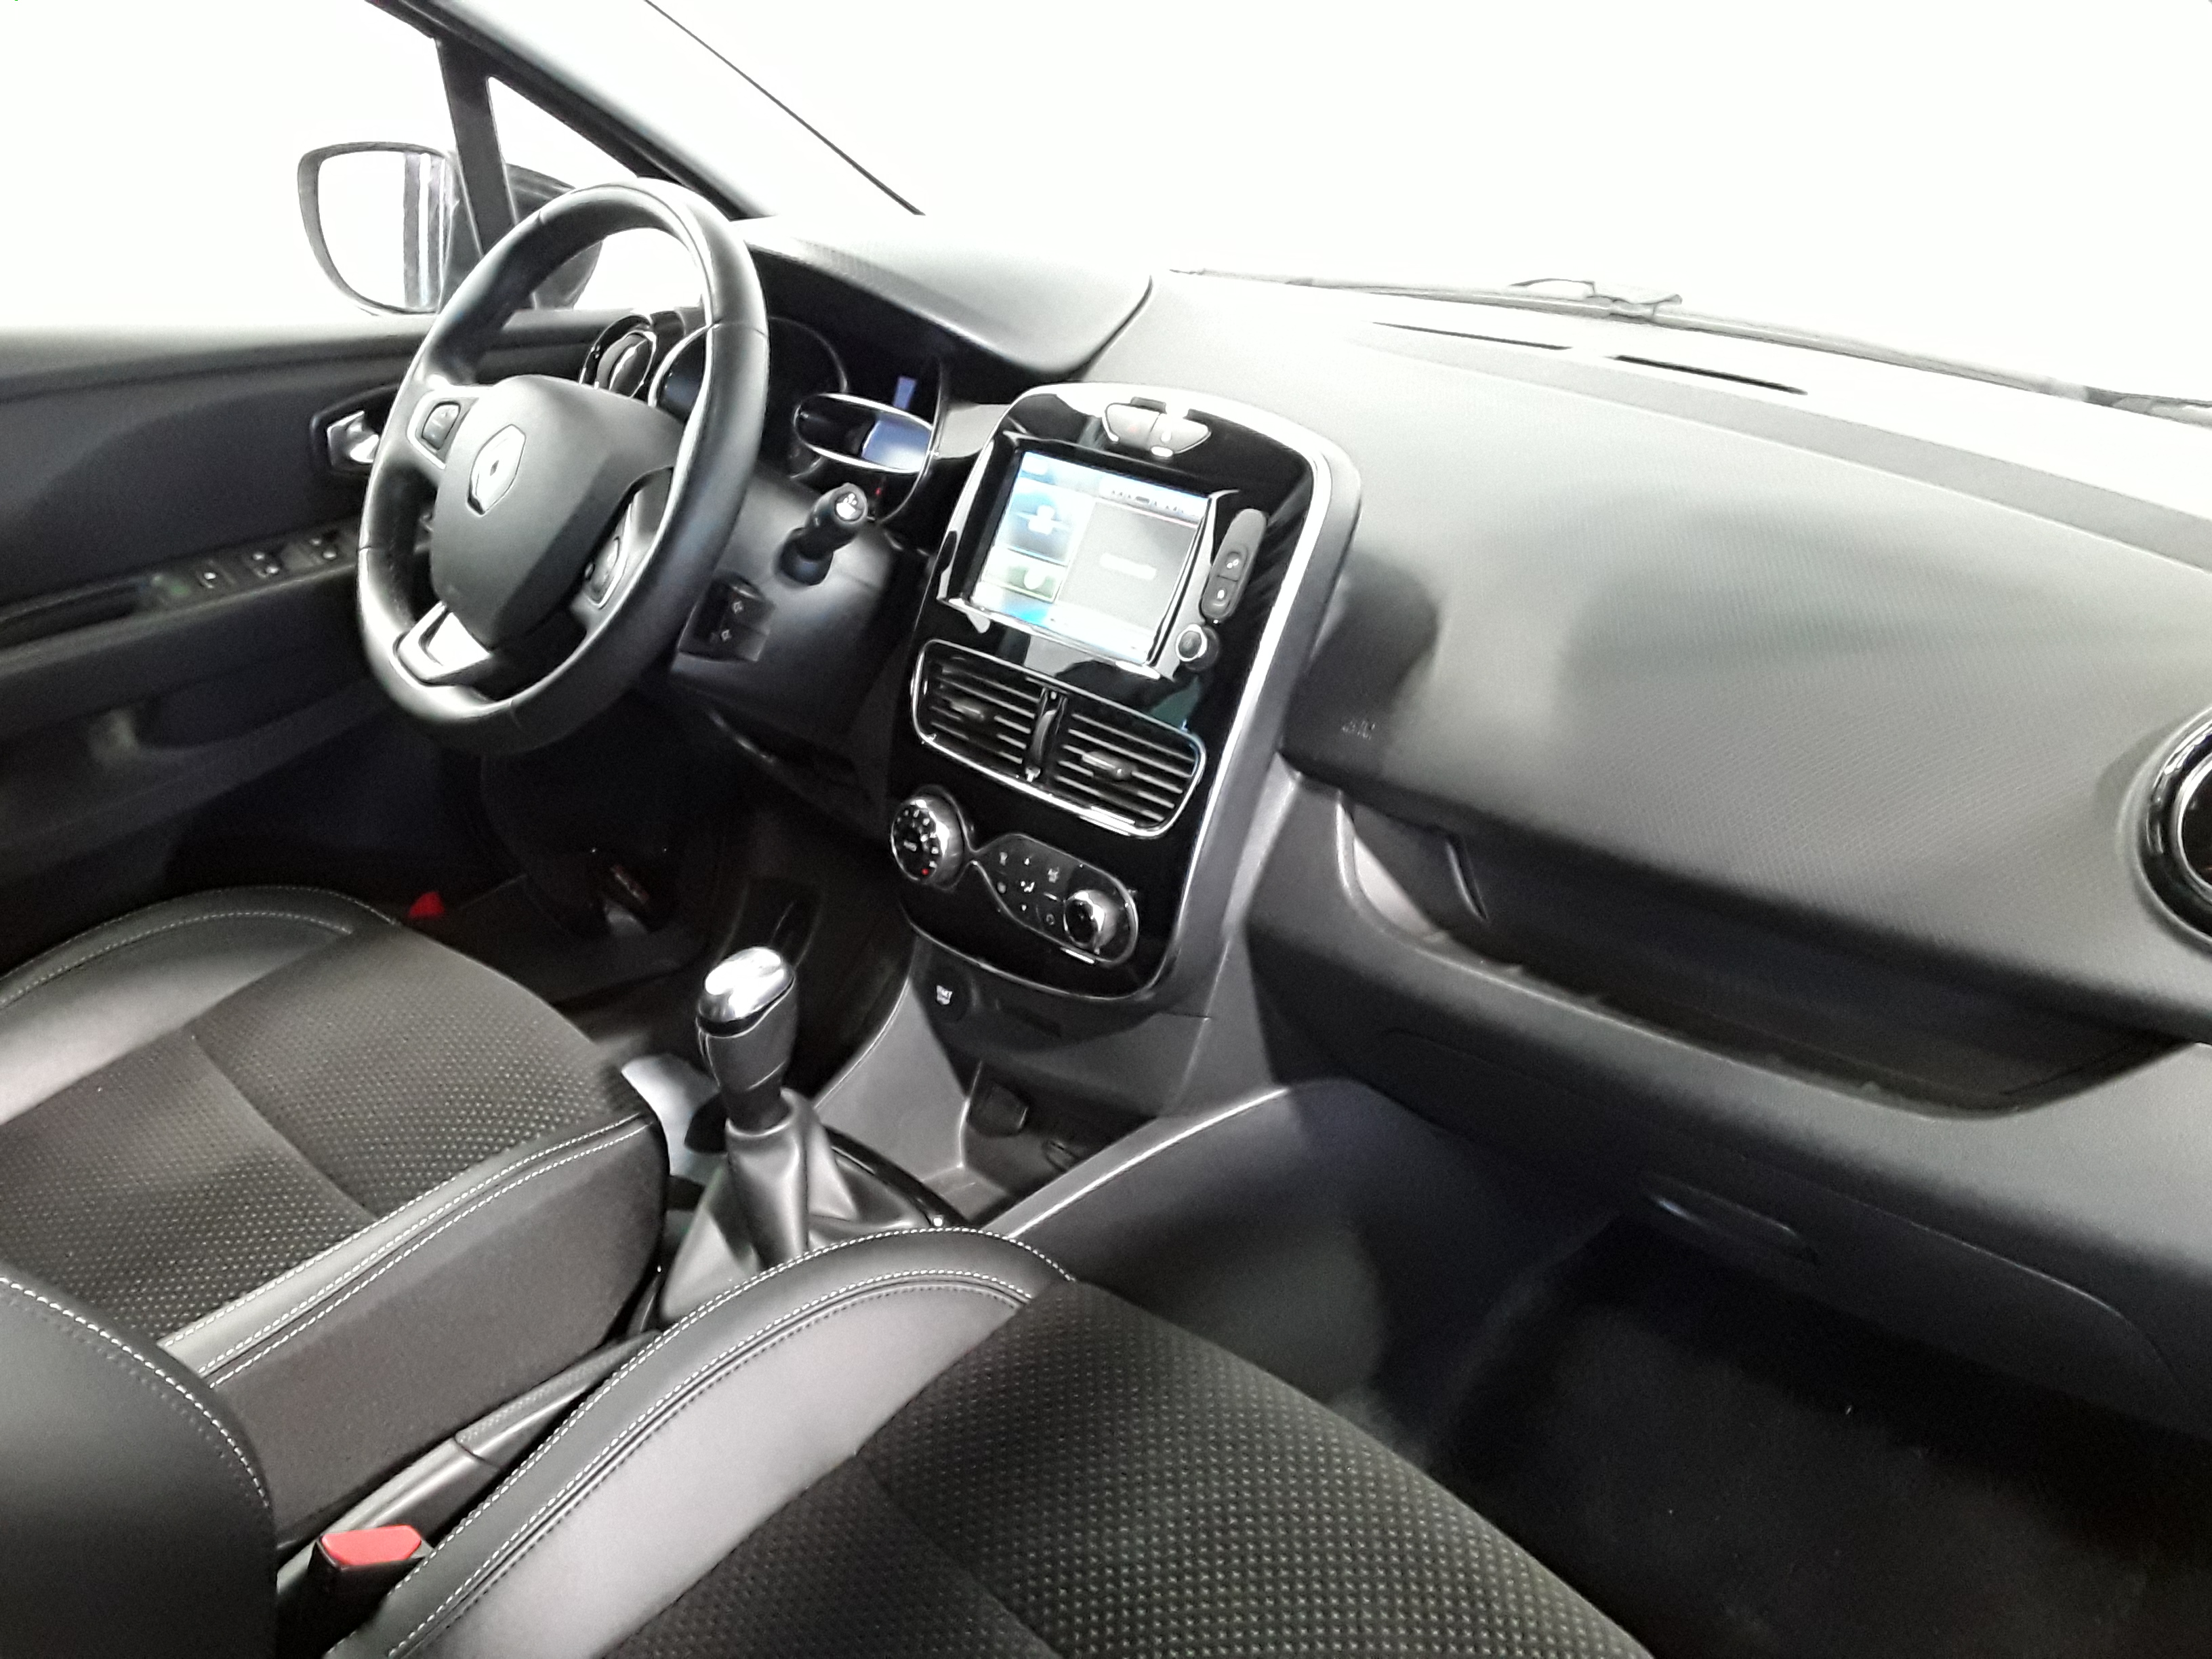 RENAULT CLIO IV 2018 à 12400 € - Photo n°5